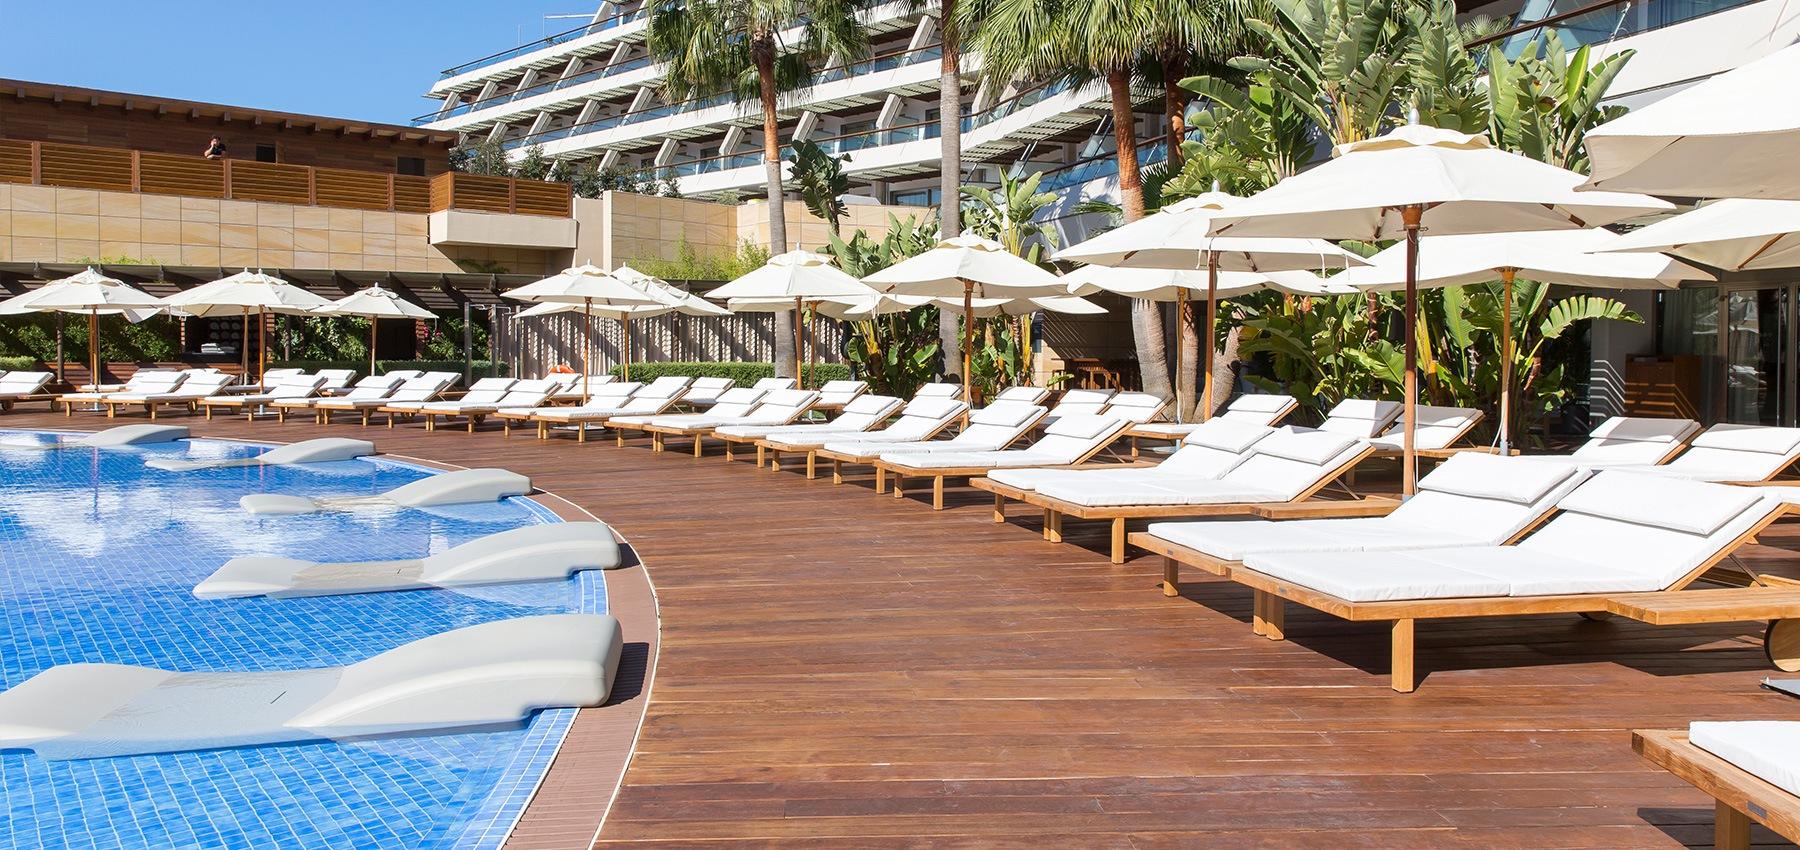 Poolside Ibiza Grand Hotel